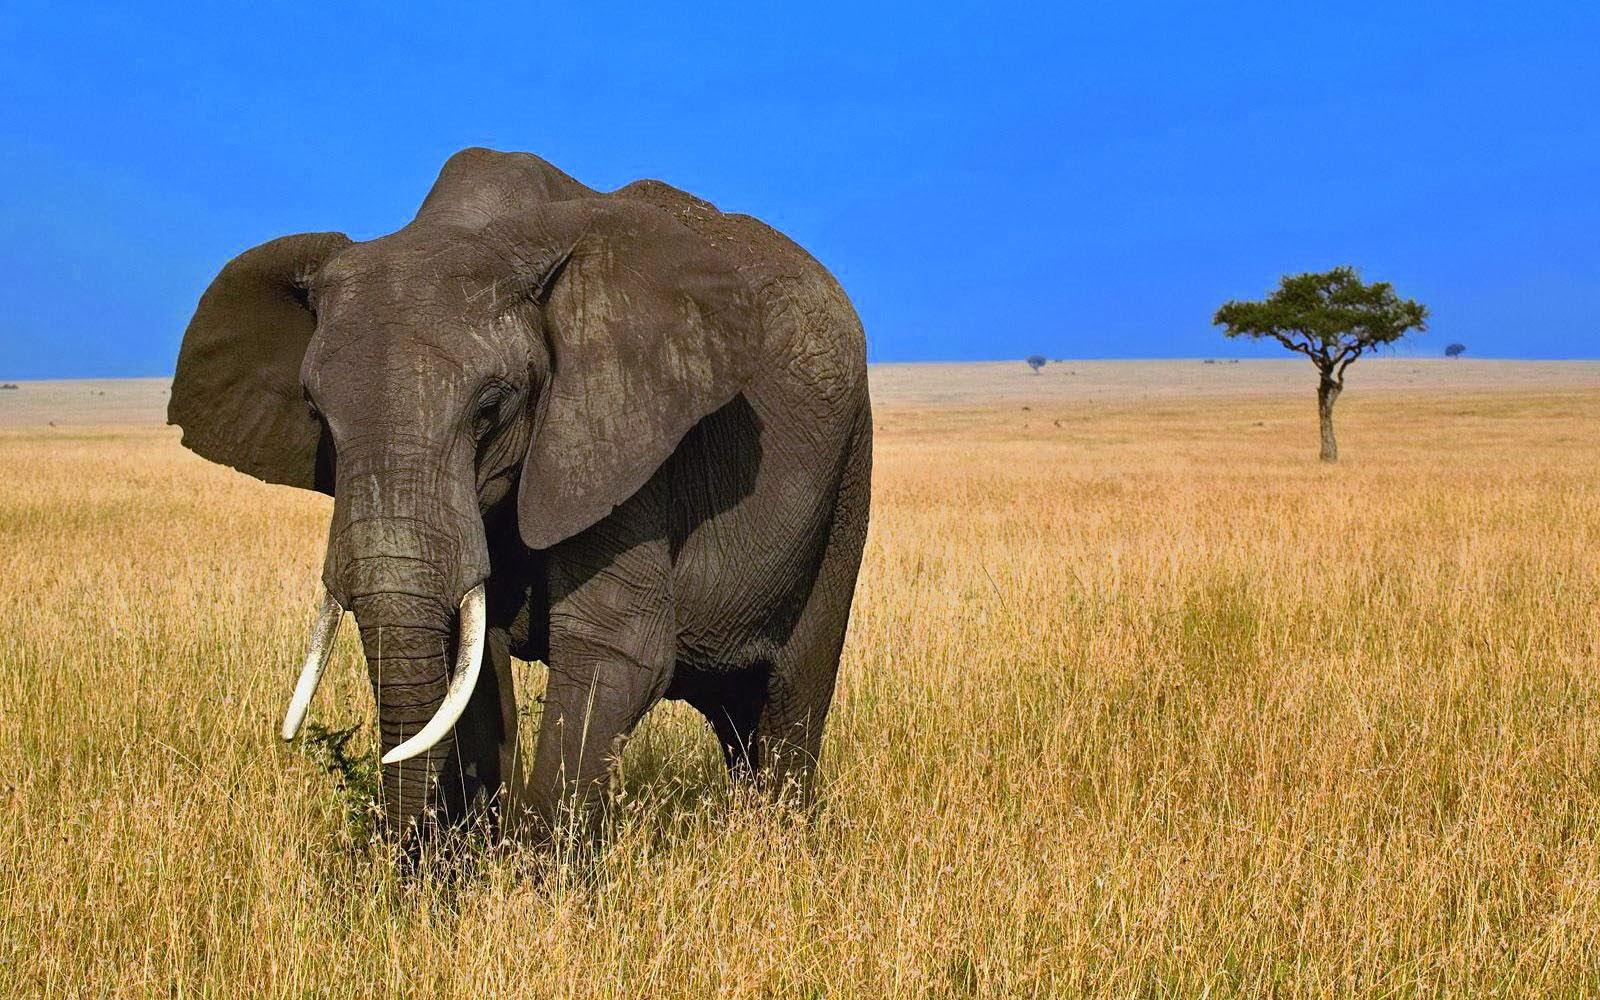 Cute Alien Iphone Wallpaper African Elephants Hd Wallpapers Free Hd Wallpapers